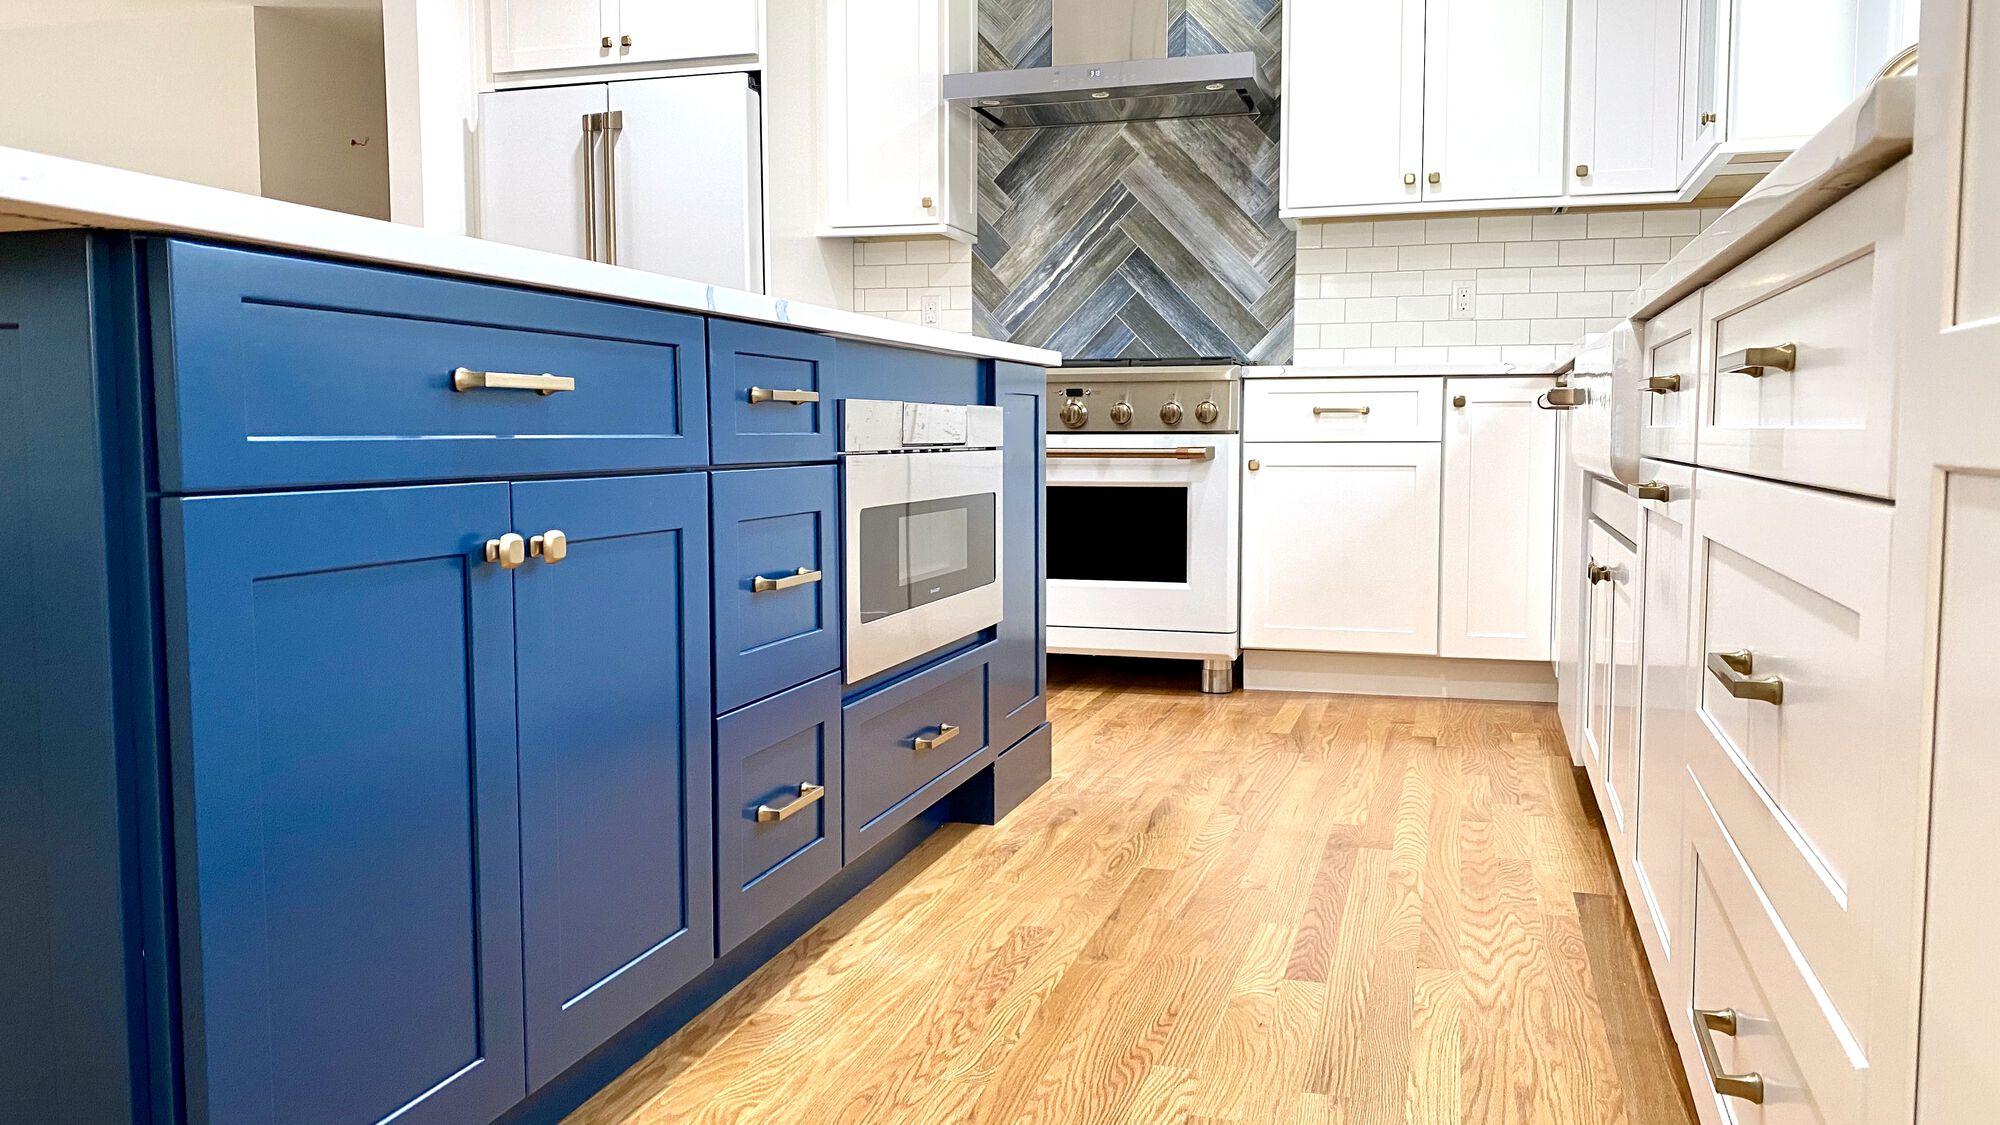 Custom Color Blue Island, Herringbone Tile and Subway Backsplash, GE Cafe Appliances in Berkeley Heights, Union County NJ